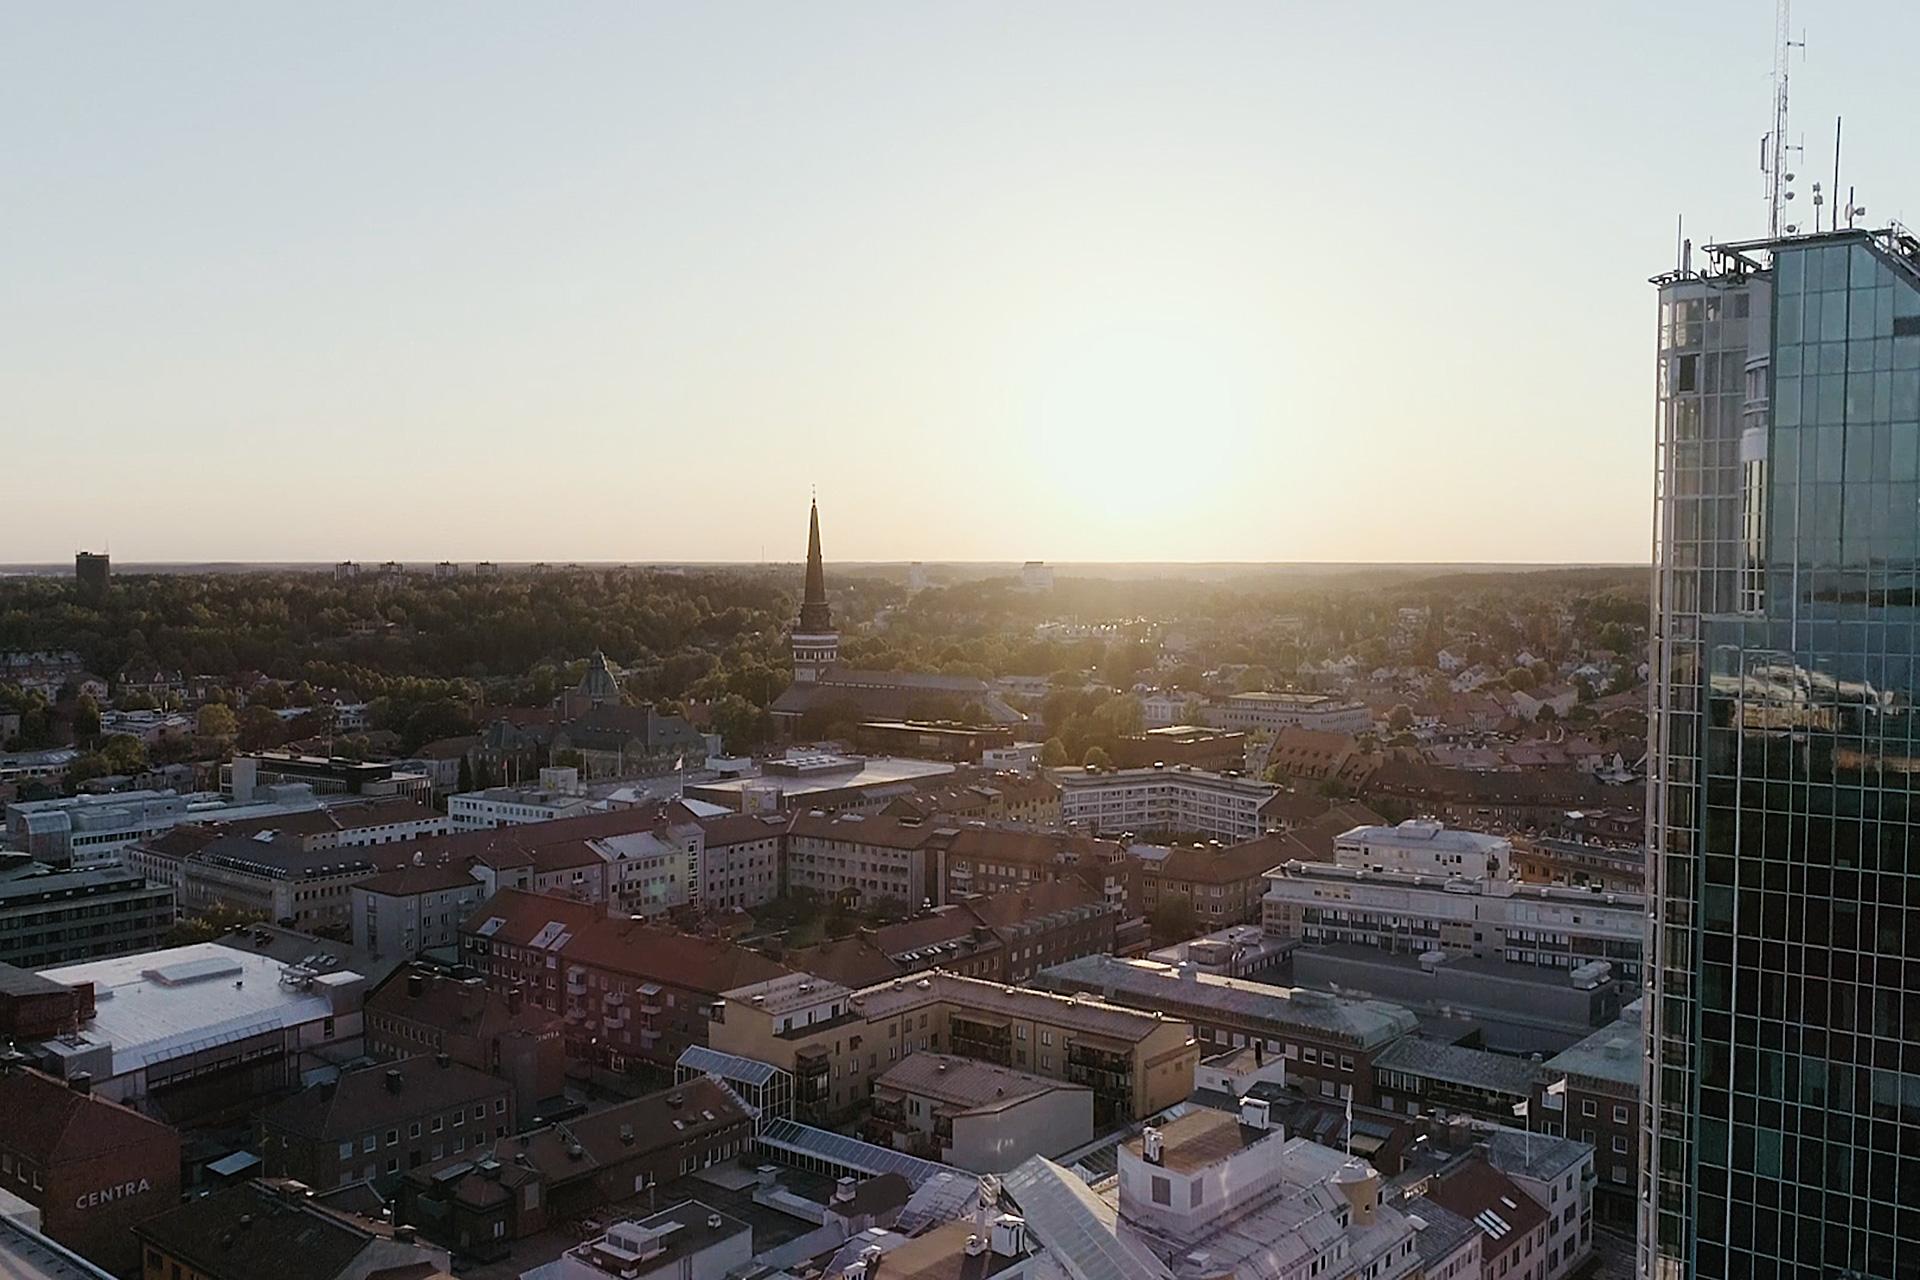 Vy över Västerås. Fotograf: Bo Lundvang